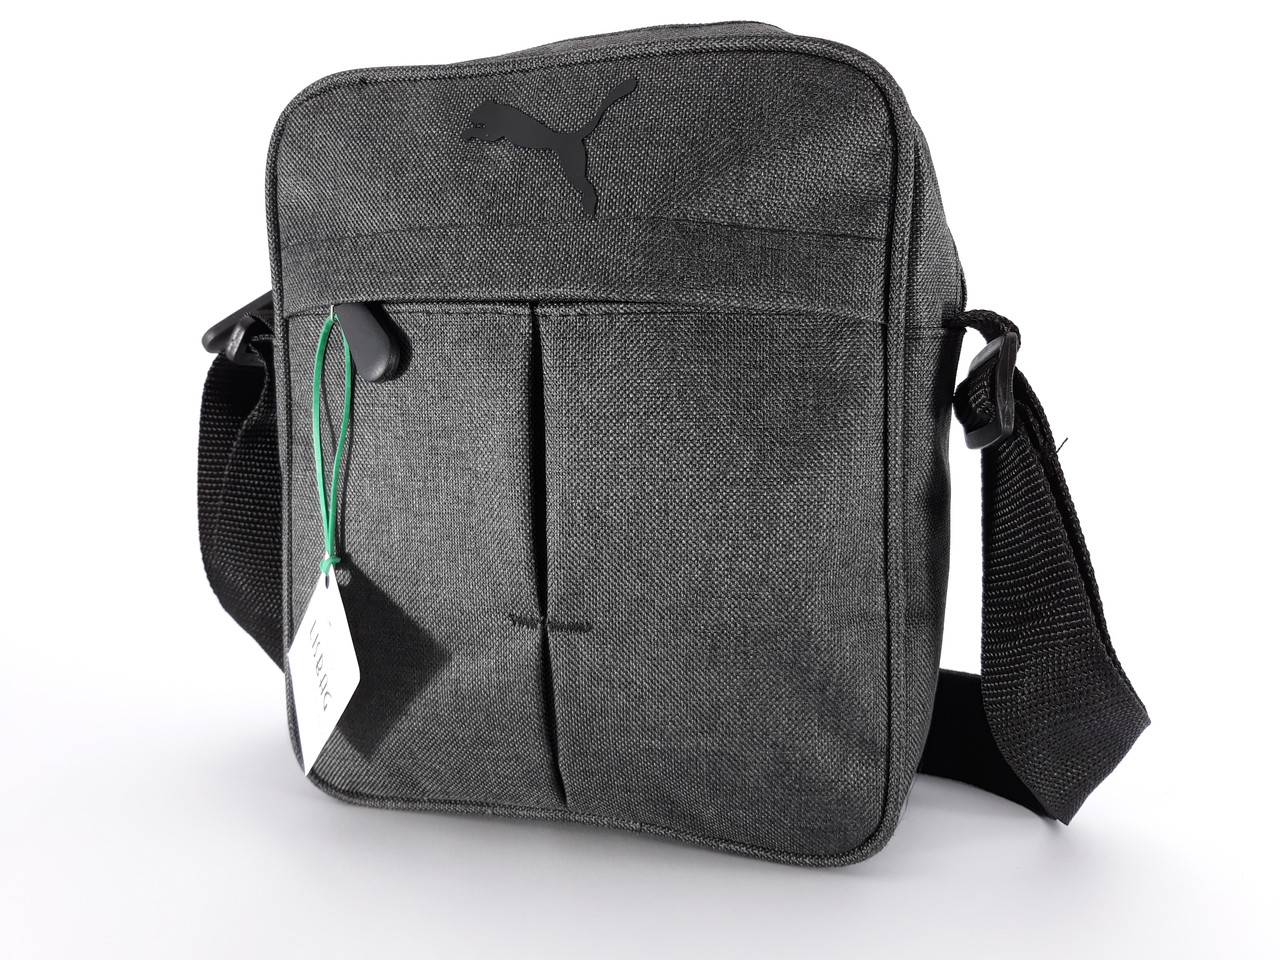 dbe91ae35feb Мужская сумка через плече спортивного типа Puma реплика люкс качества  Темно-серая